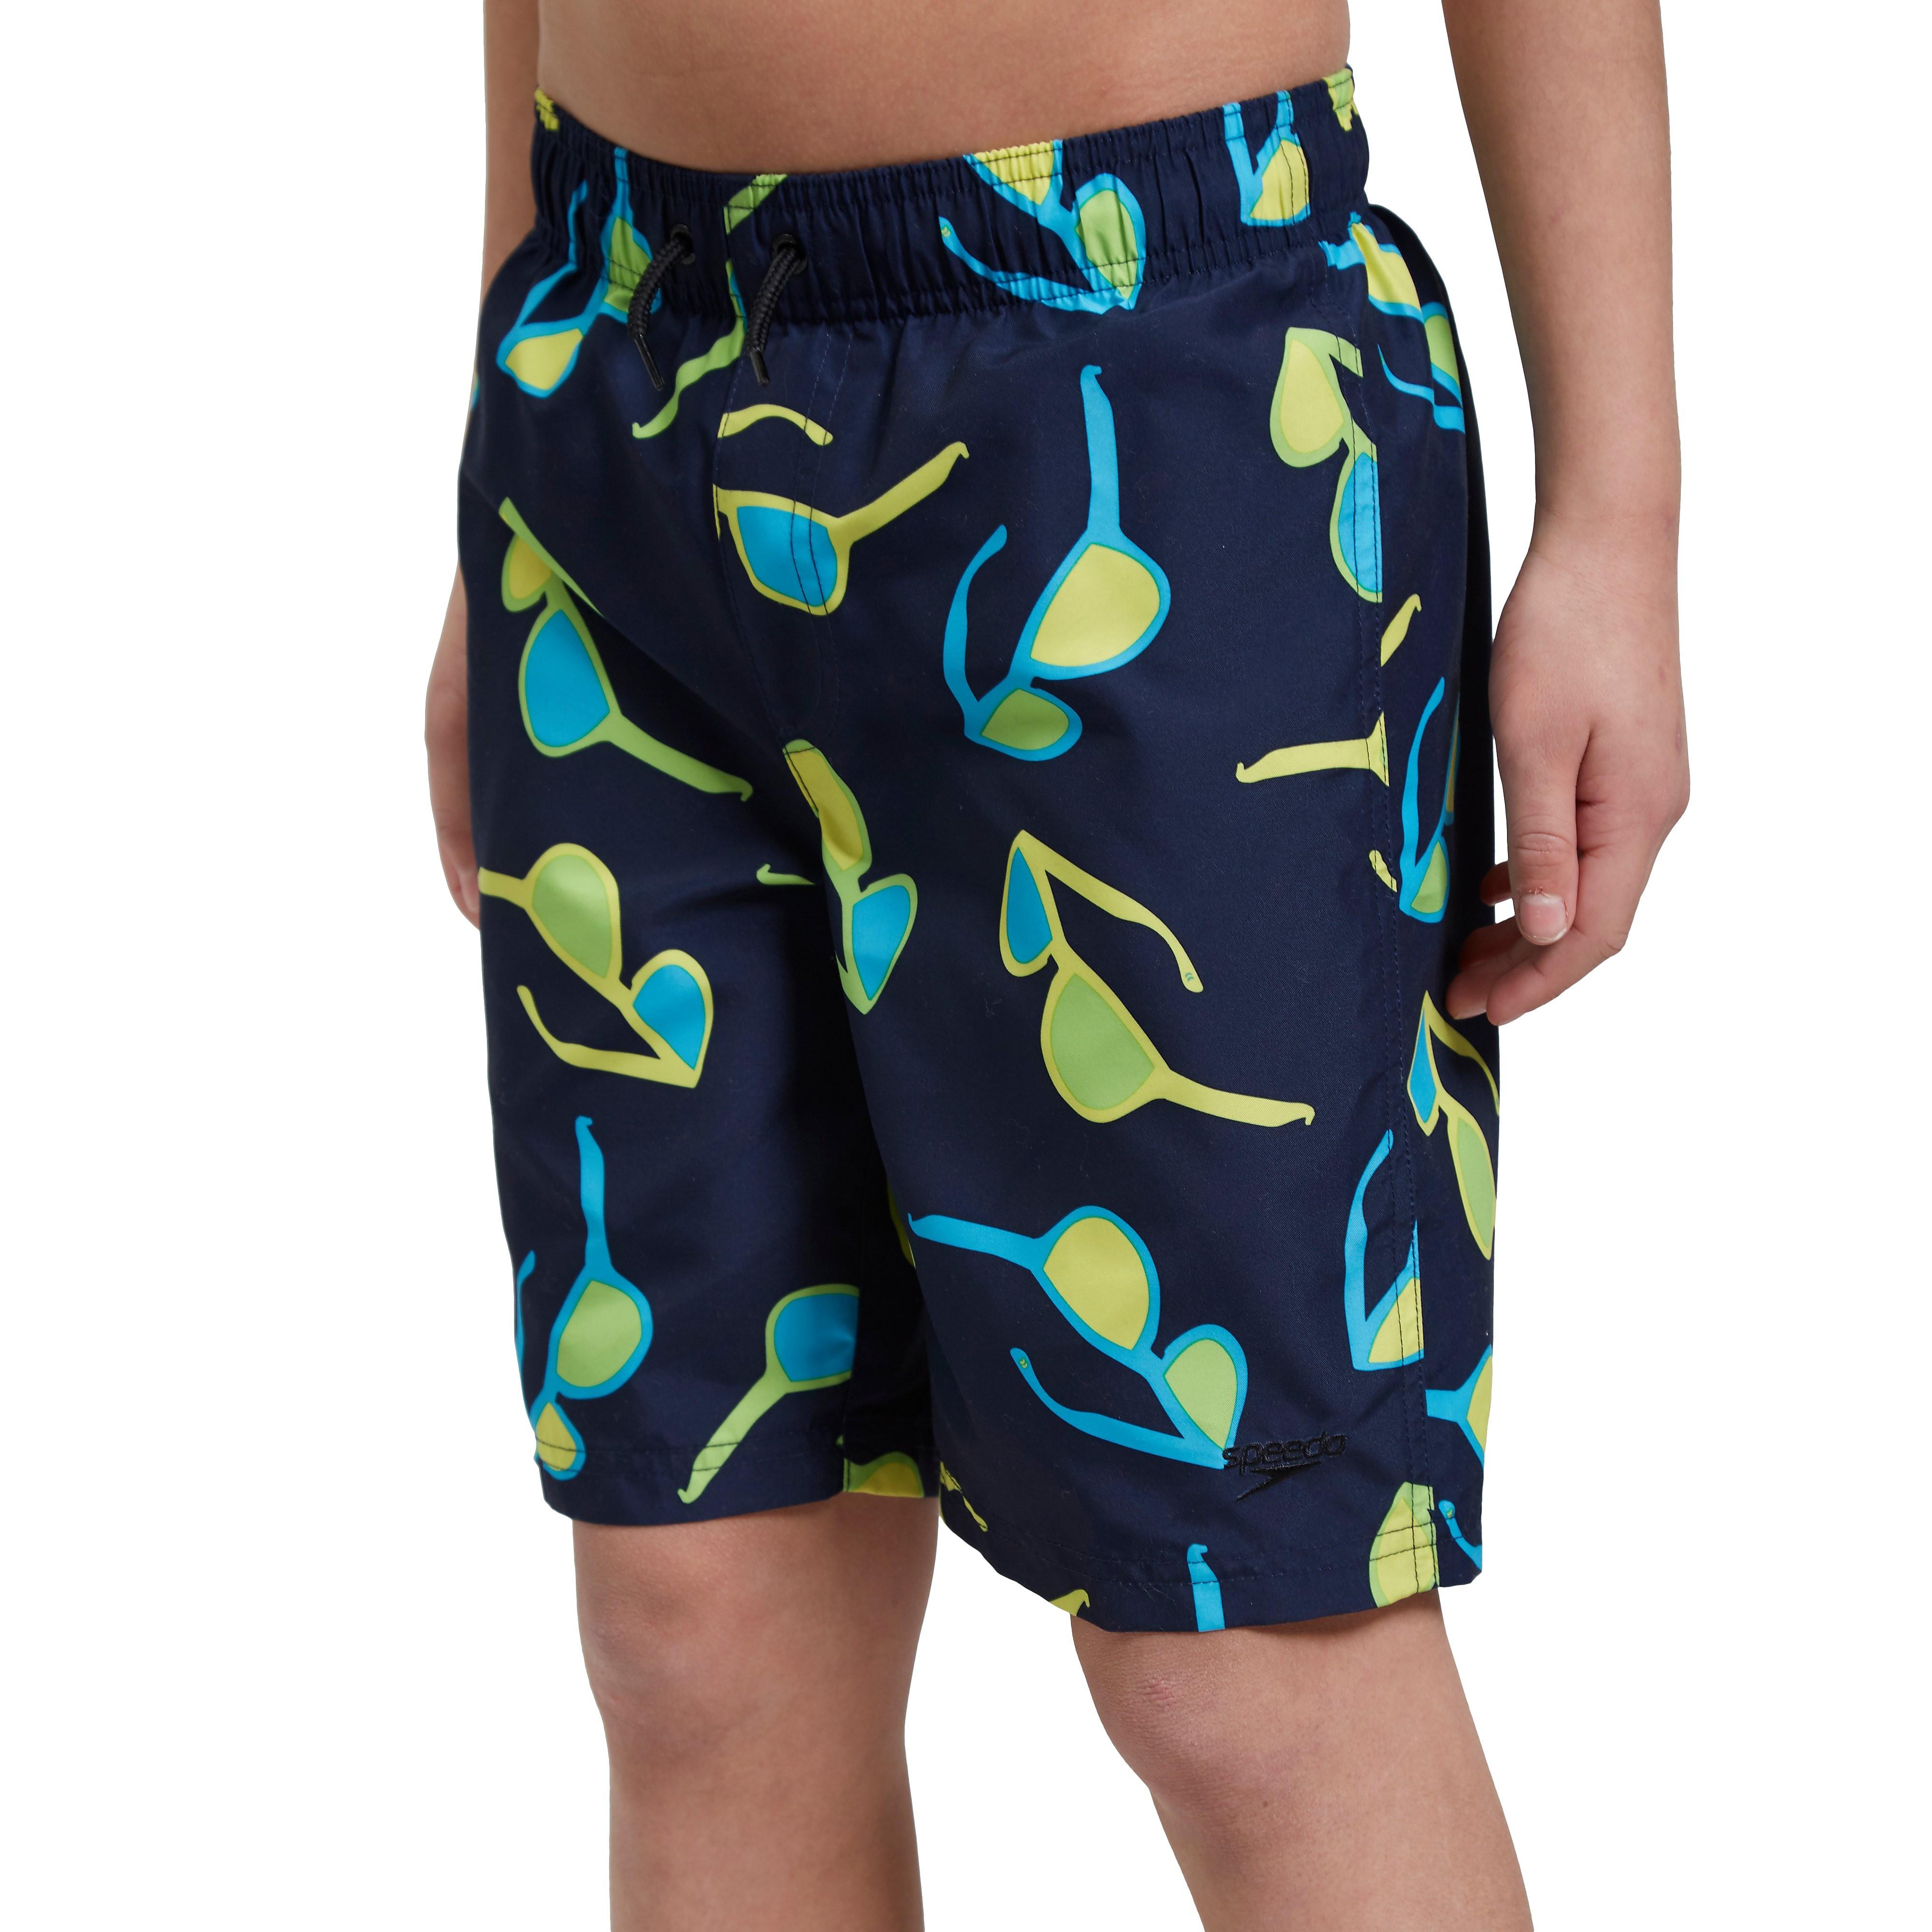 "Speedo Polka Solar Printed 17"" Junior Swim Short"